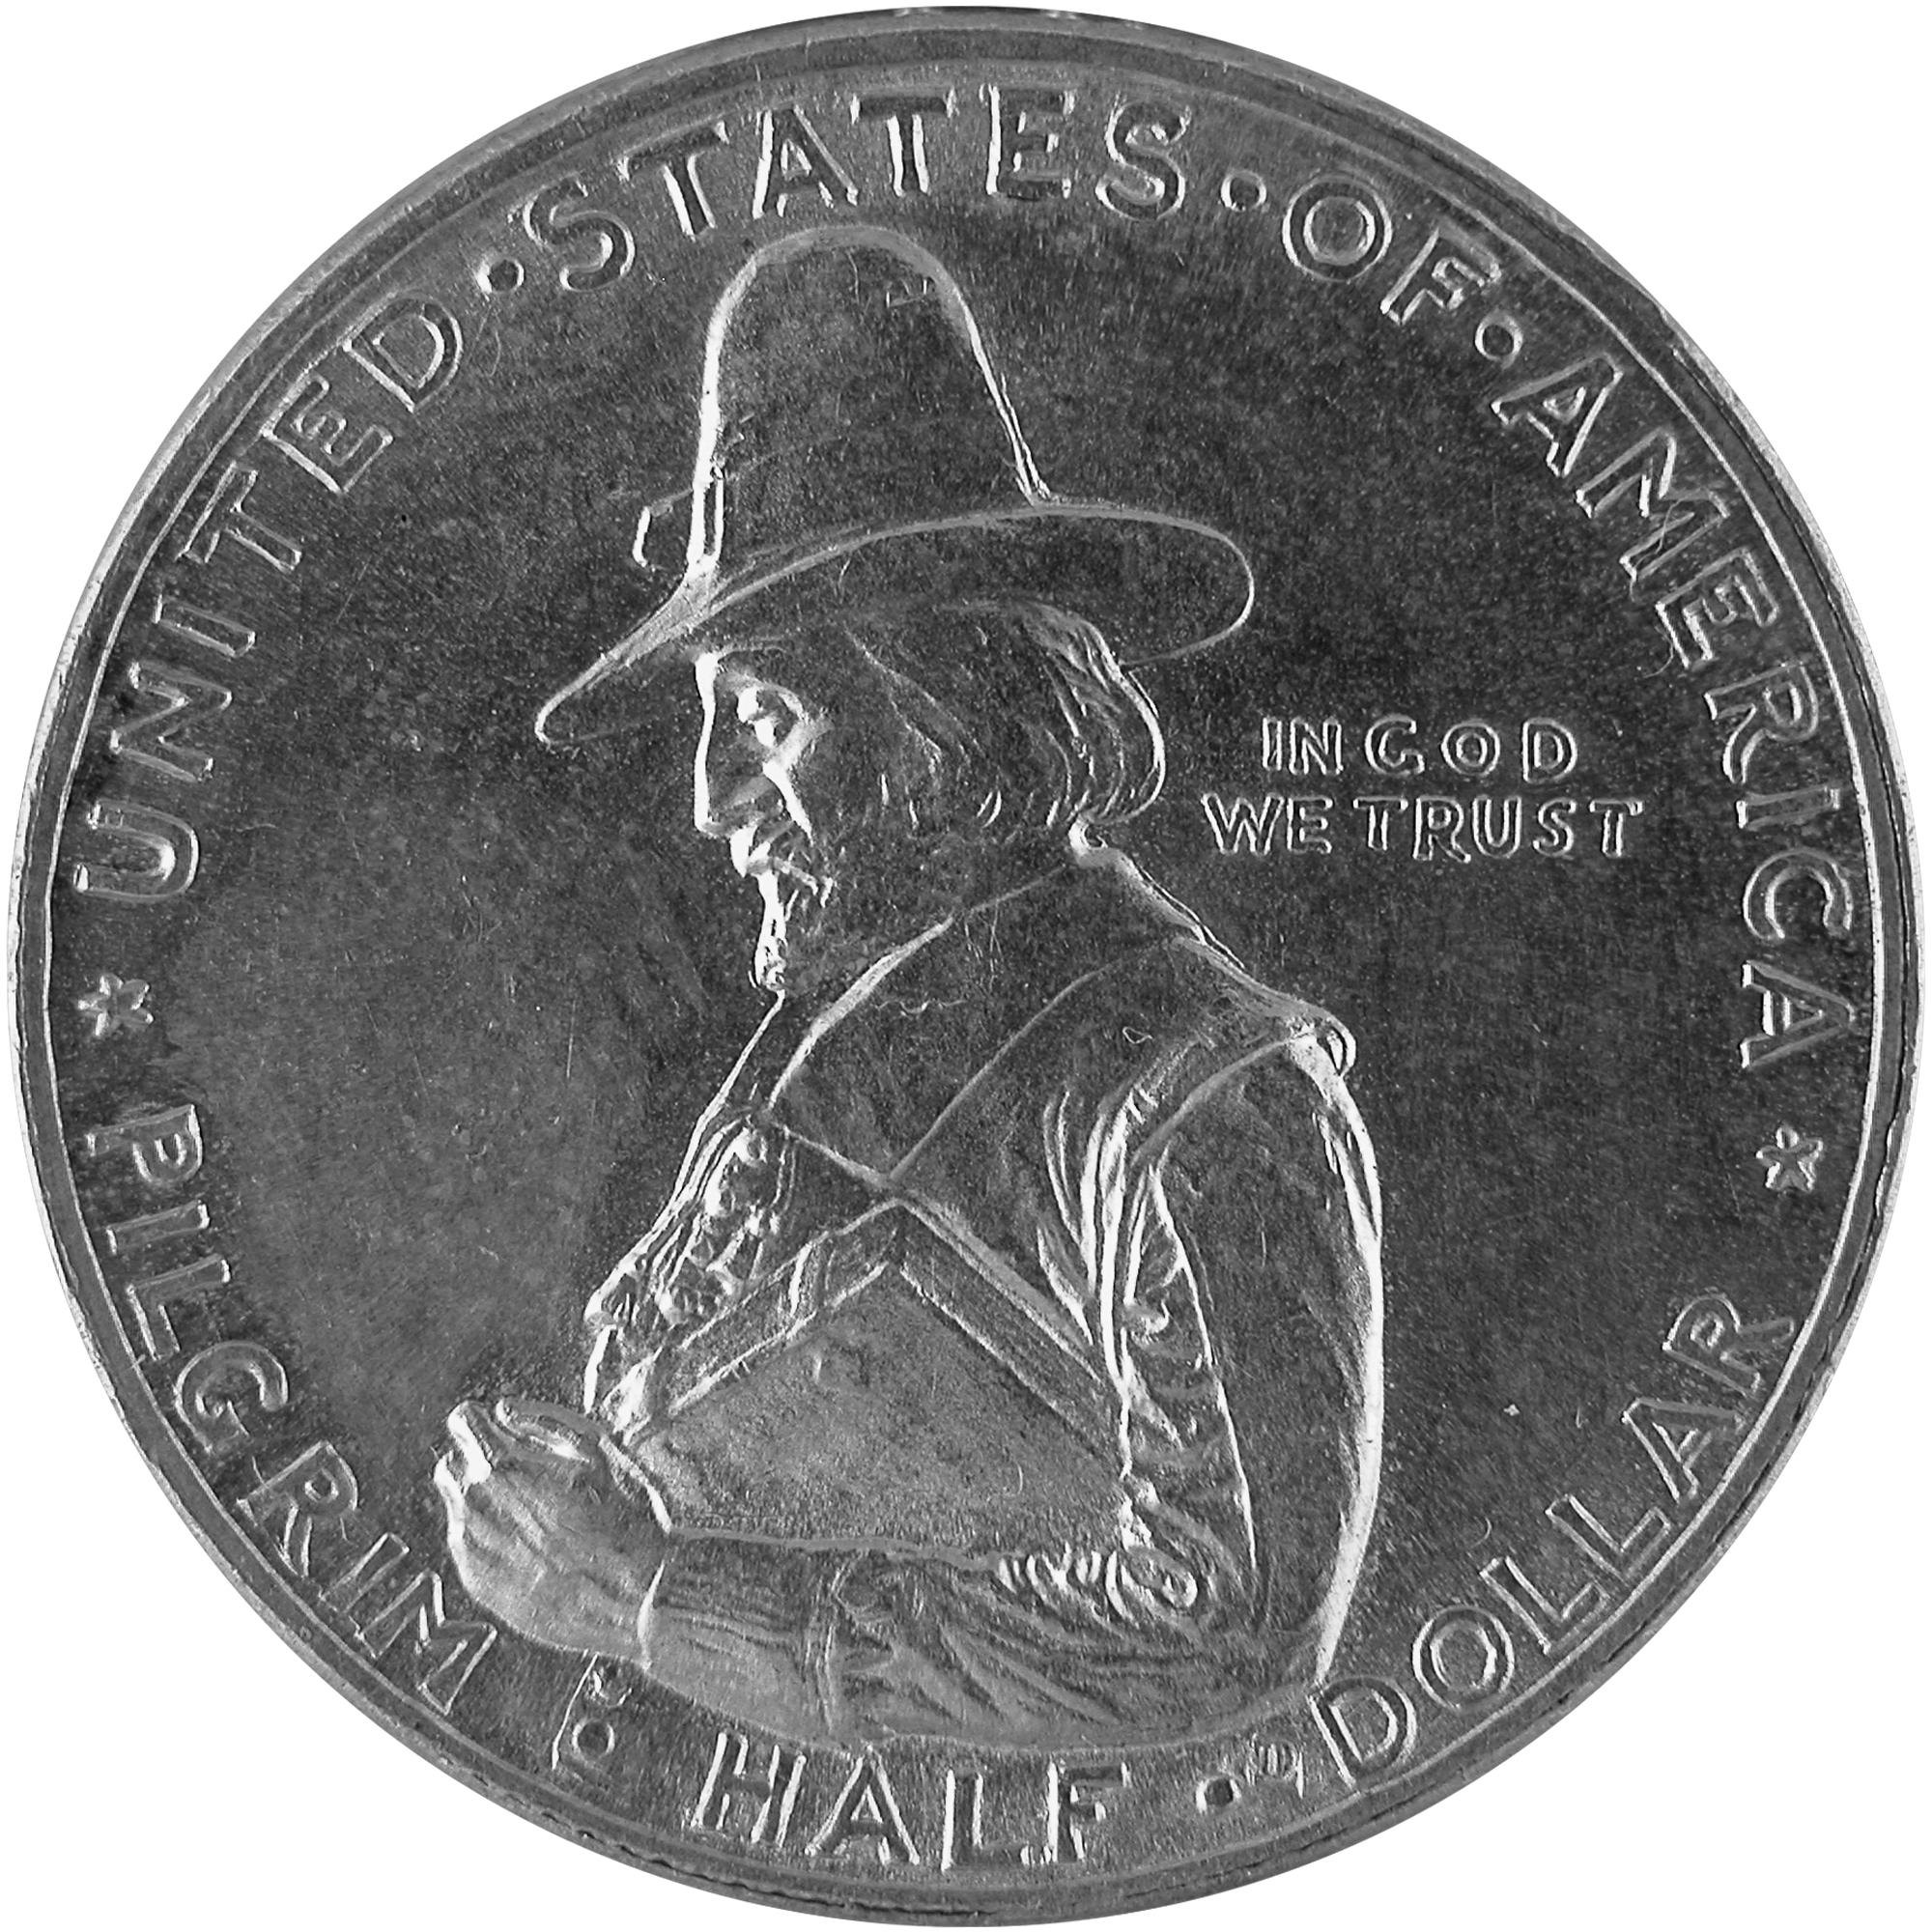 1920 Pilgrim Tercentenary Commemorative Silver Half Dollar Coin Obverse